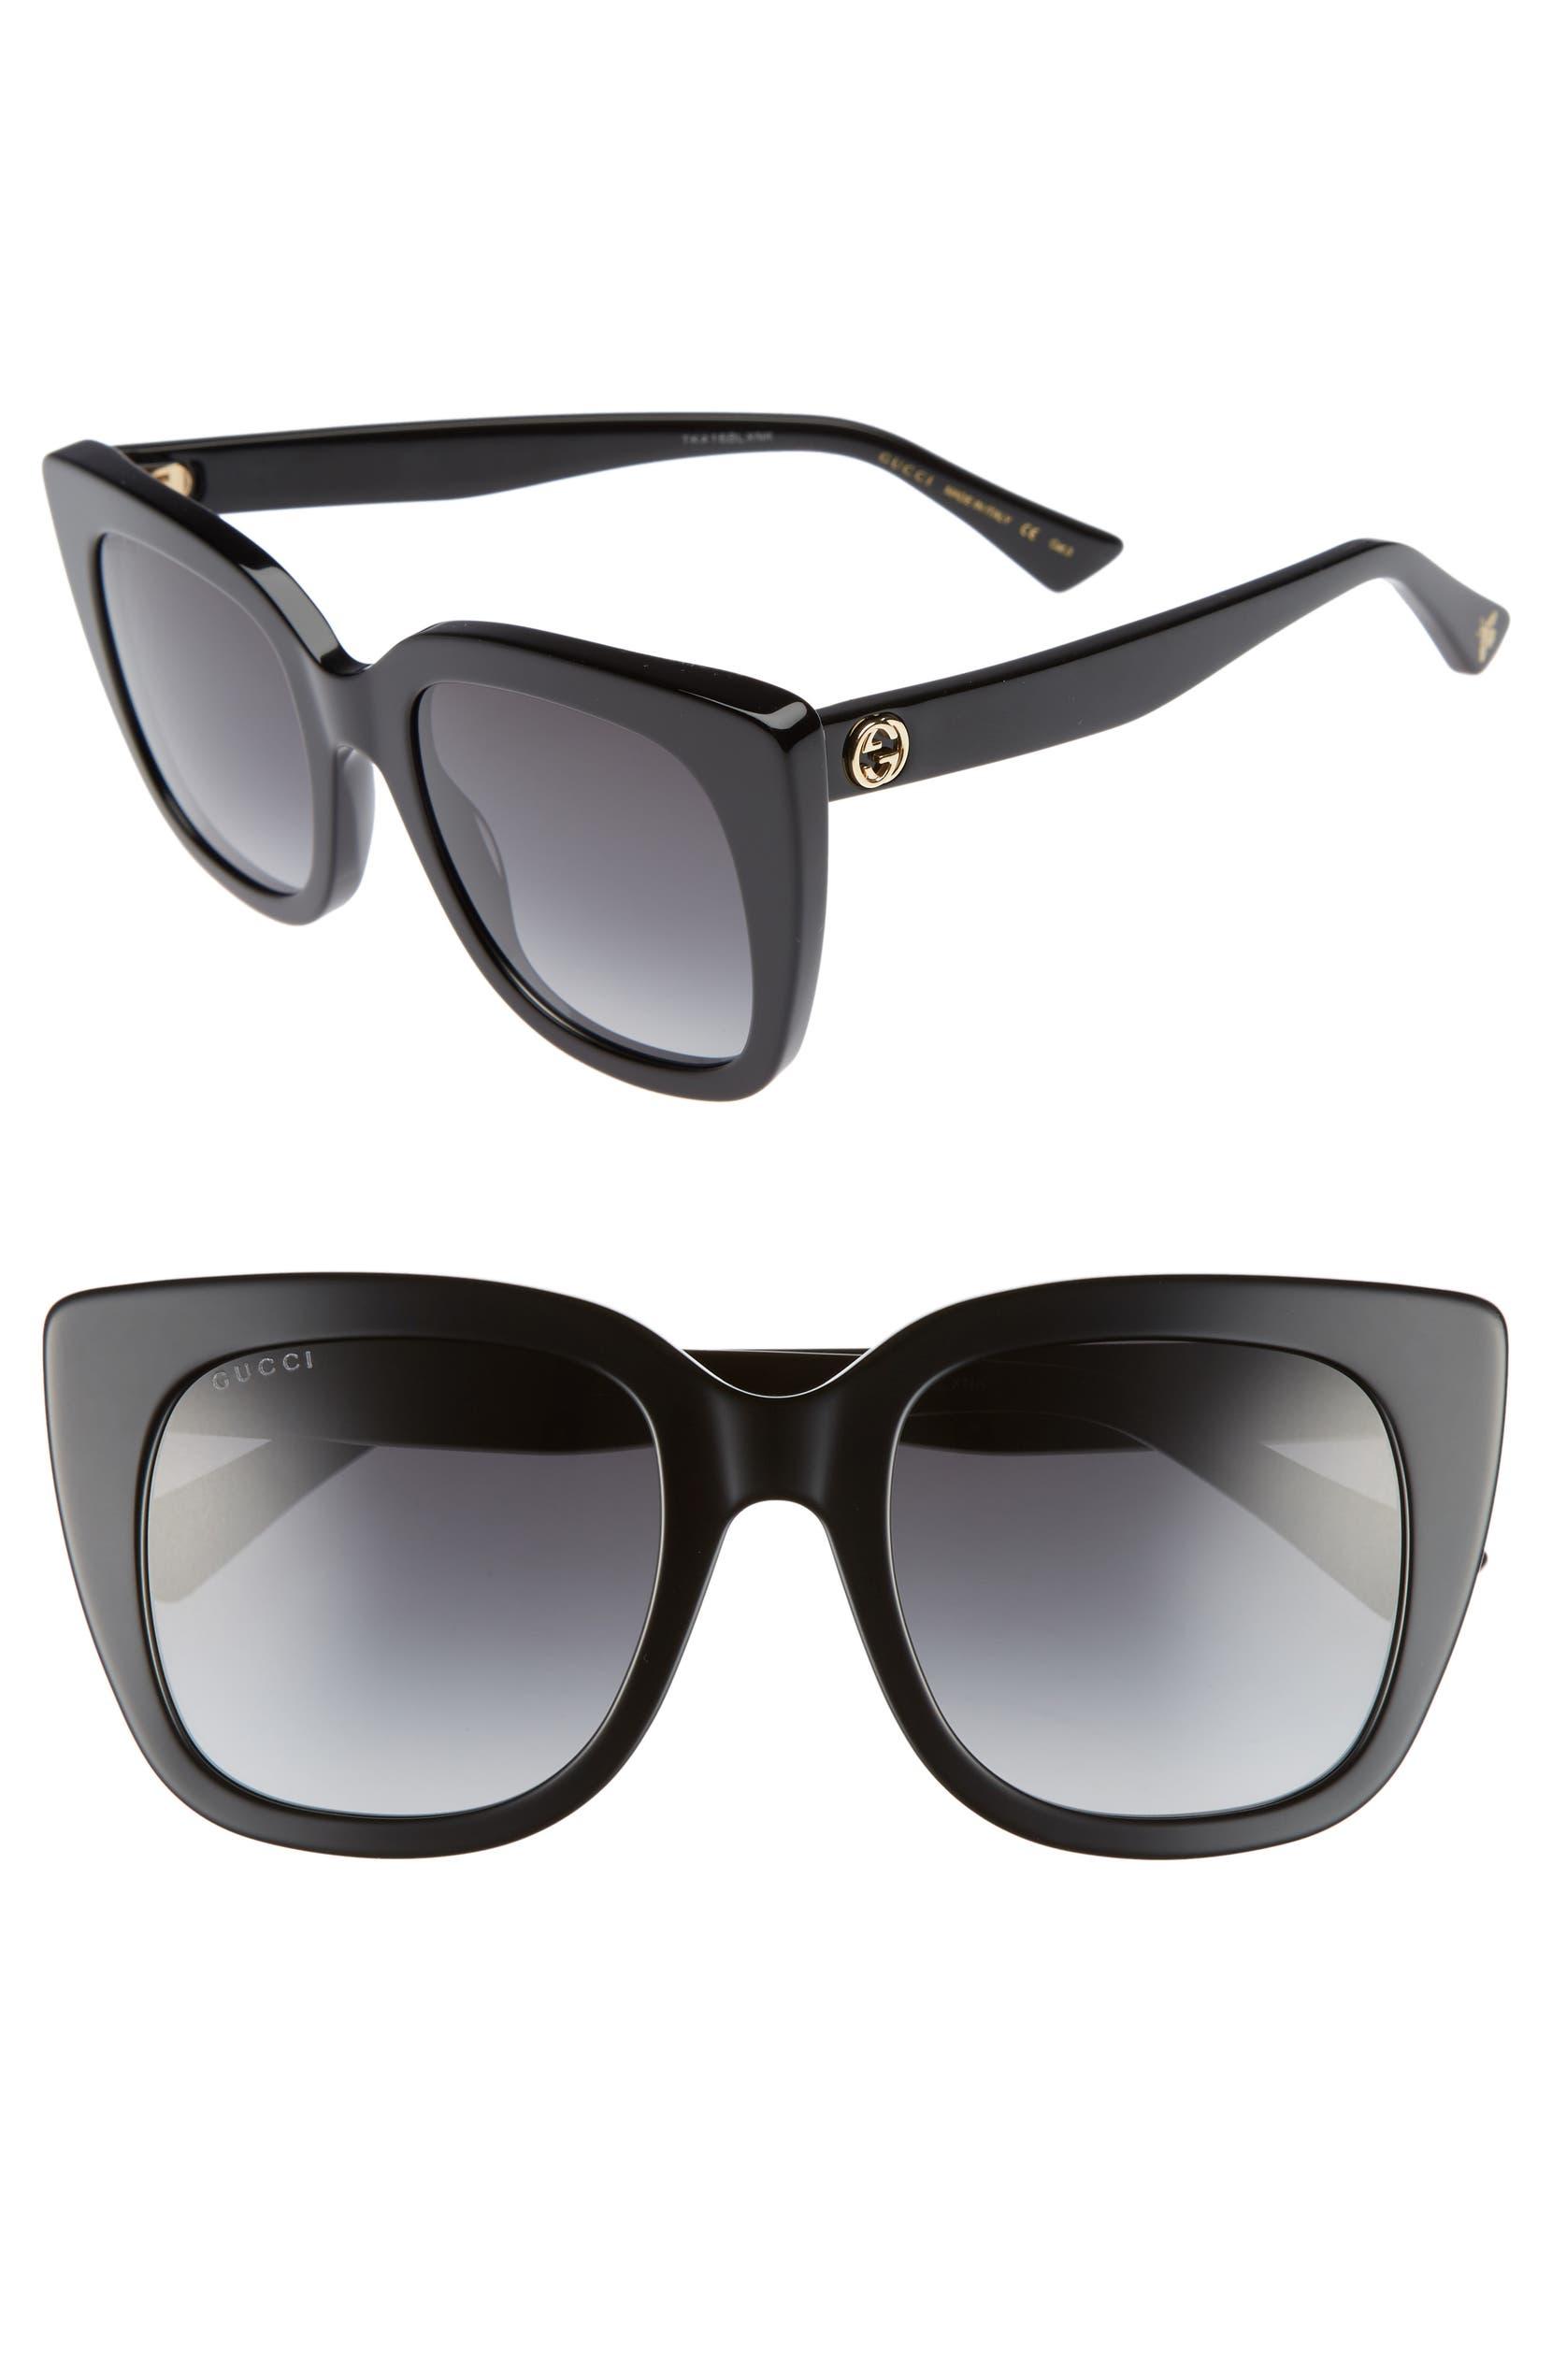 8887edb15 Gucci 51mm Cat Eye Sunglasses   Nordstrom